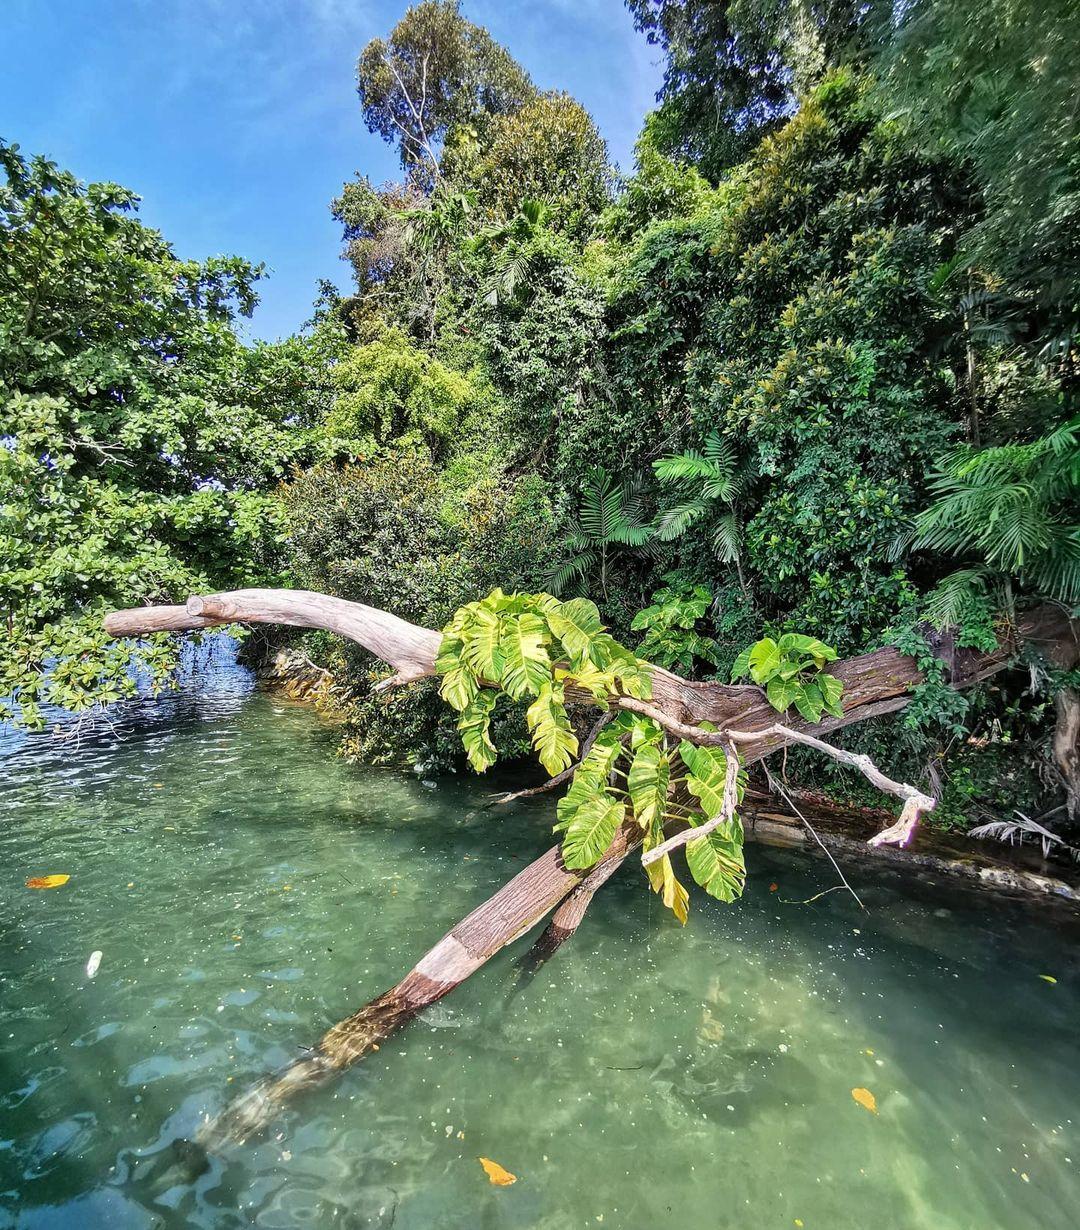 bukit chermin boardwalk - high tide